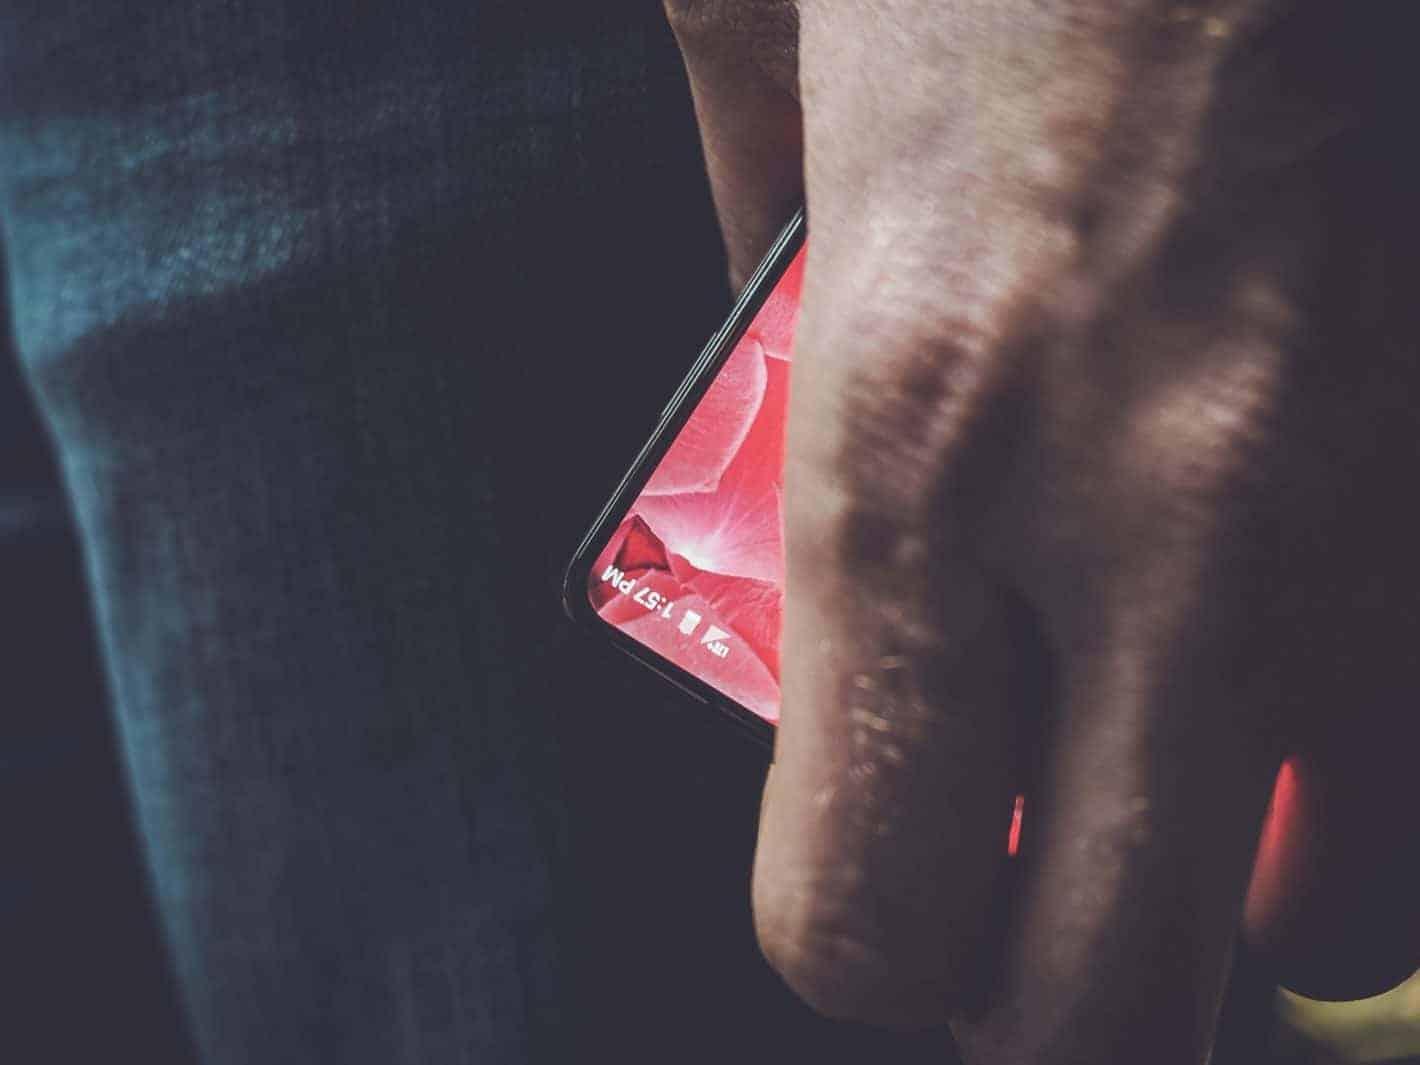 Essential smartphone teaser 1